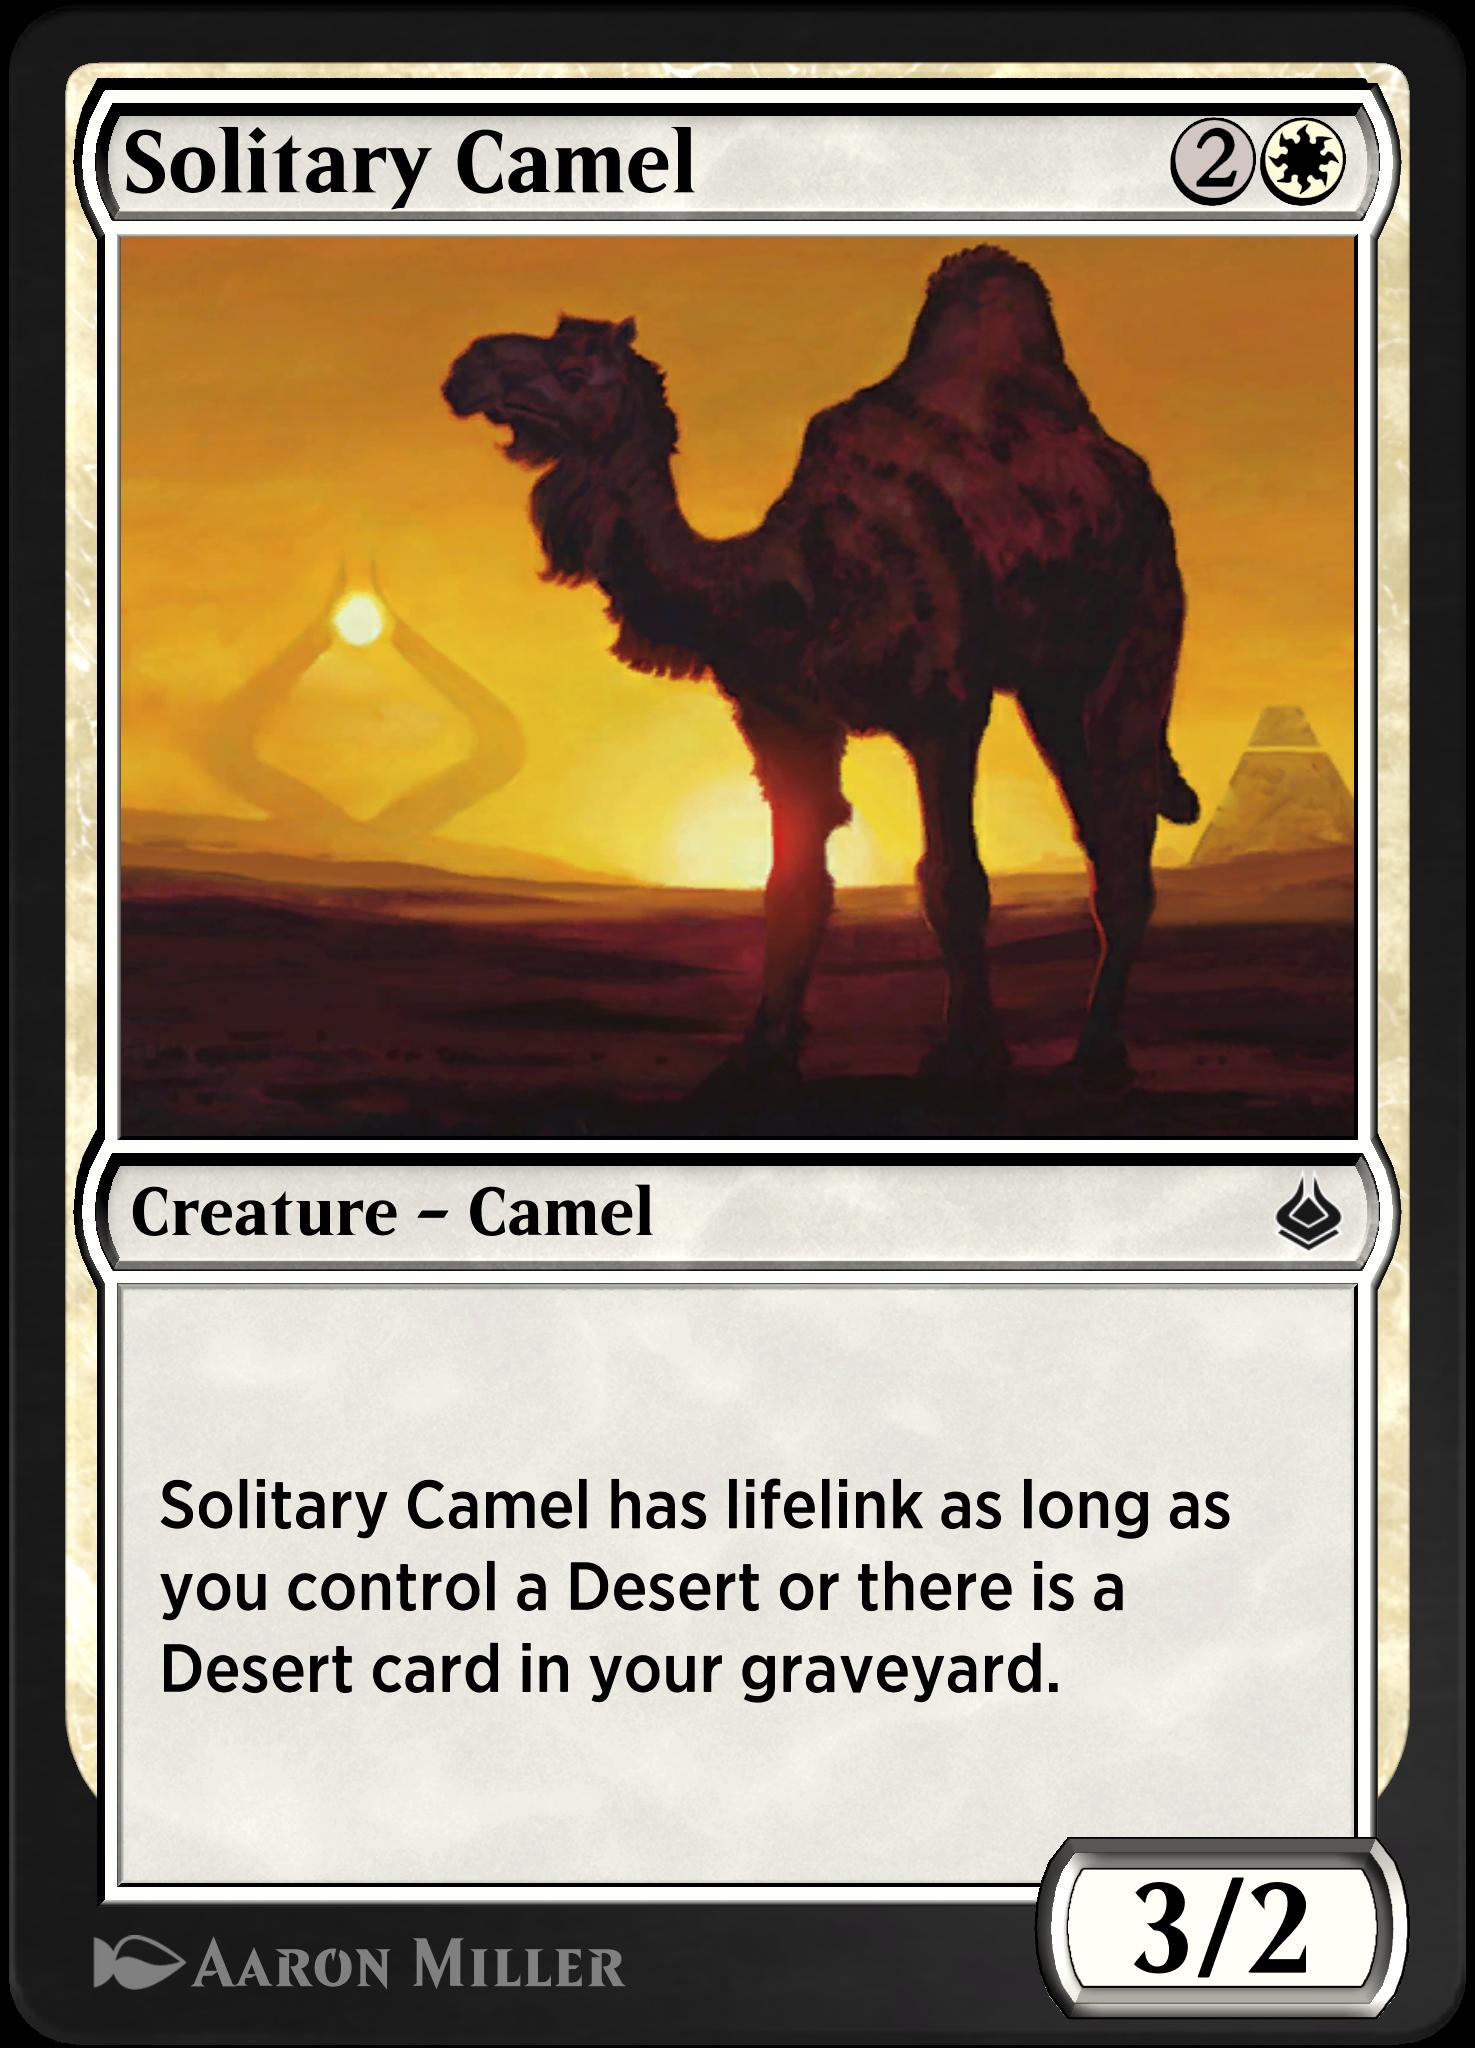 Solitary Camel